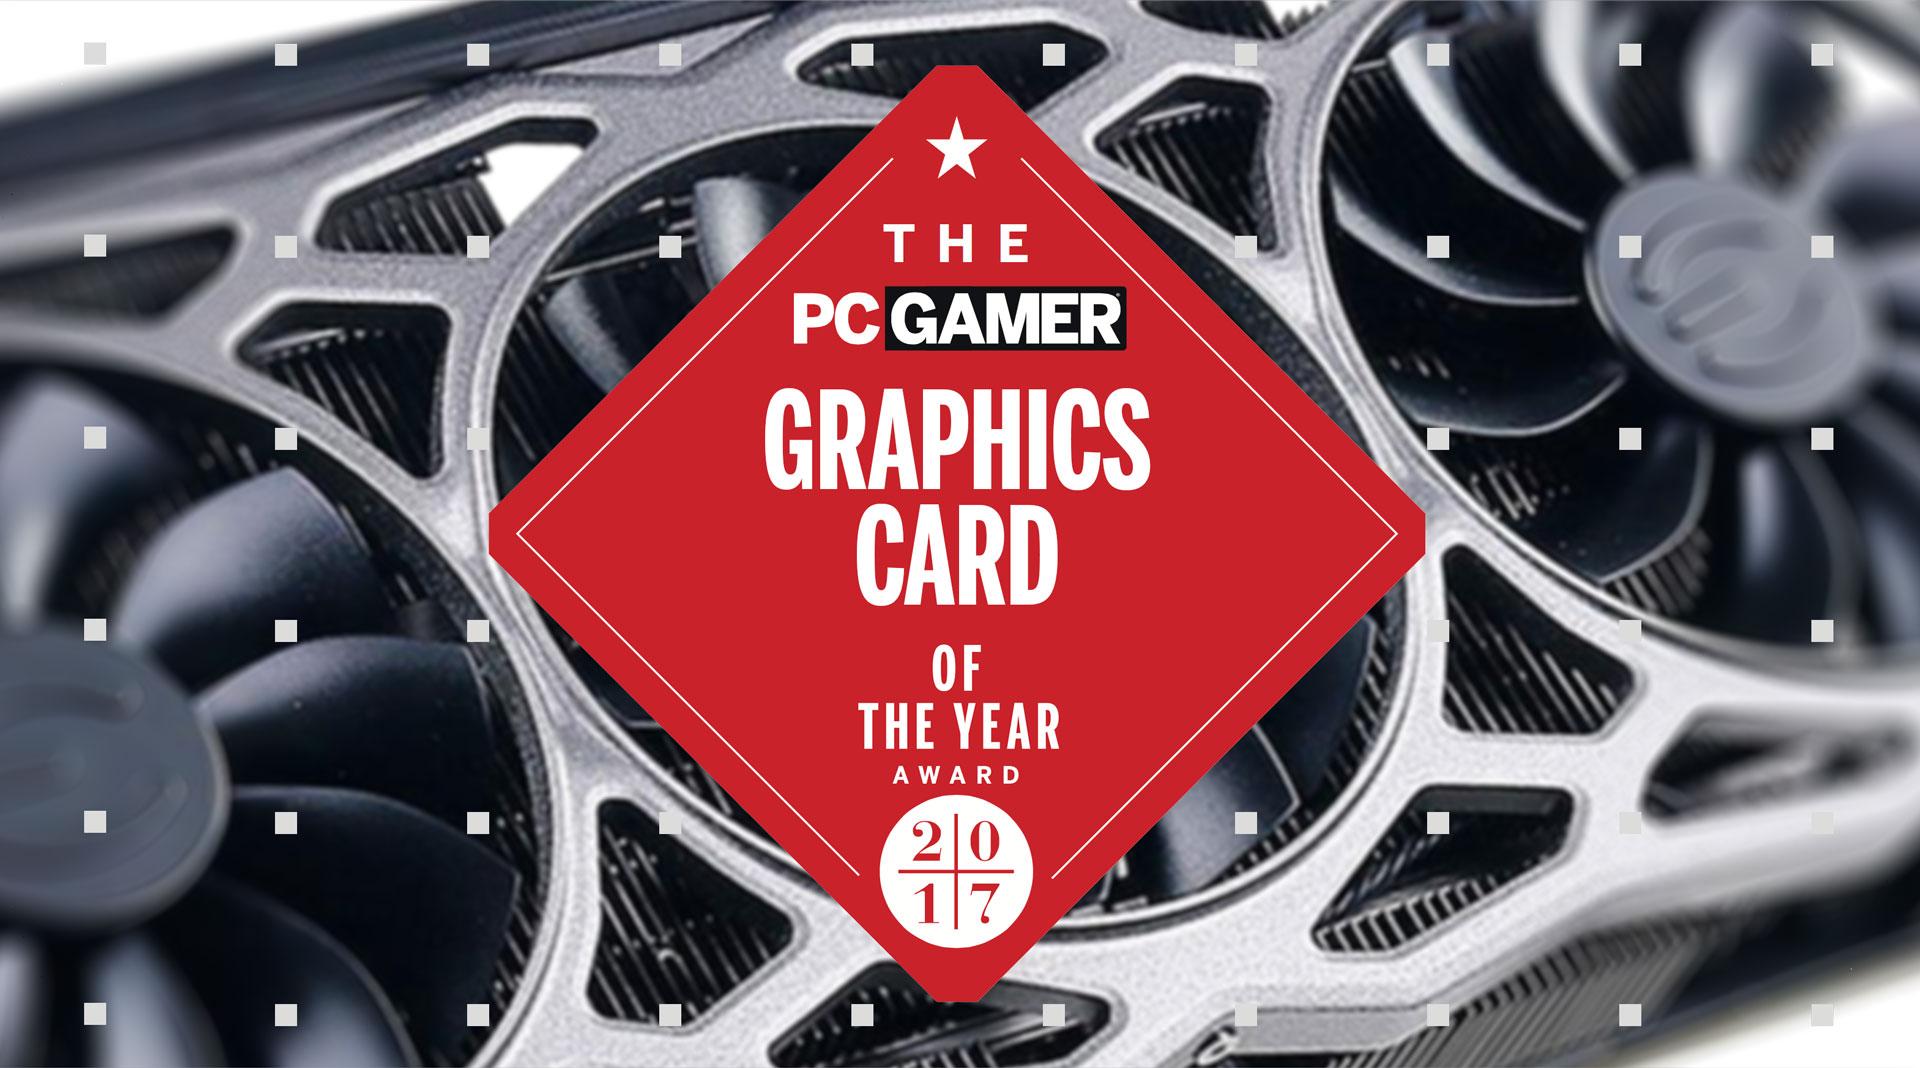 Graphics Card of the Year: EVGA GTX 1080 Ti FTW3 Elite